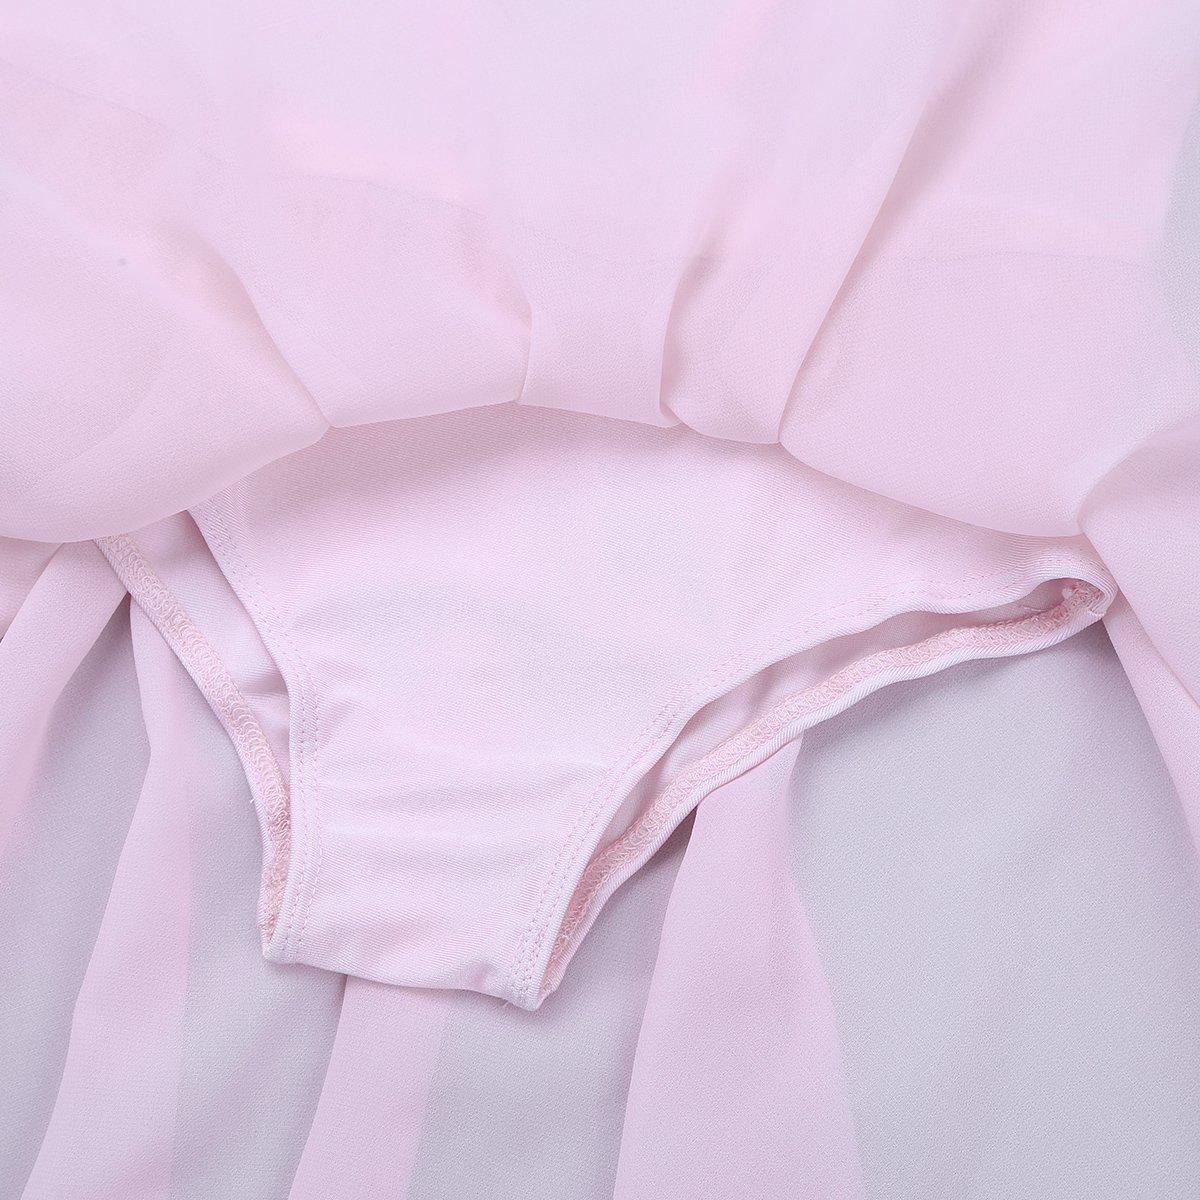 iixpin Maillot Vestido de Ballet Danza para Ni/ñas Chicas Leotardo de Gimnasia con Falda Gasa Body de Ballet Fiesta Tut/ú Princesa Elegante Traje de Danza Competici/ón 3-14 A/ños